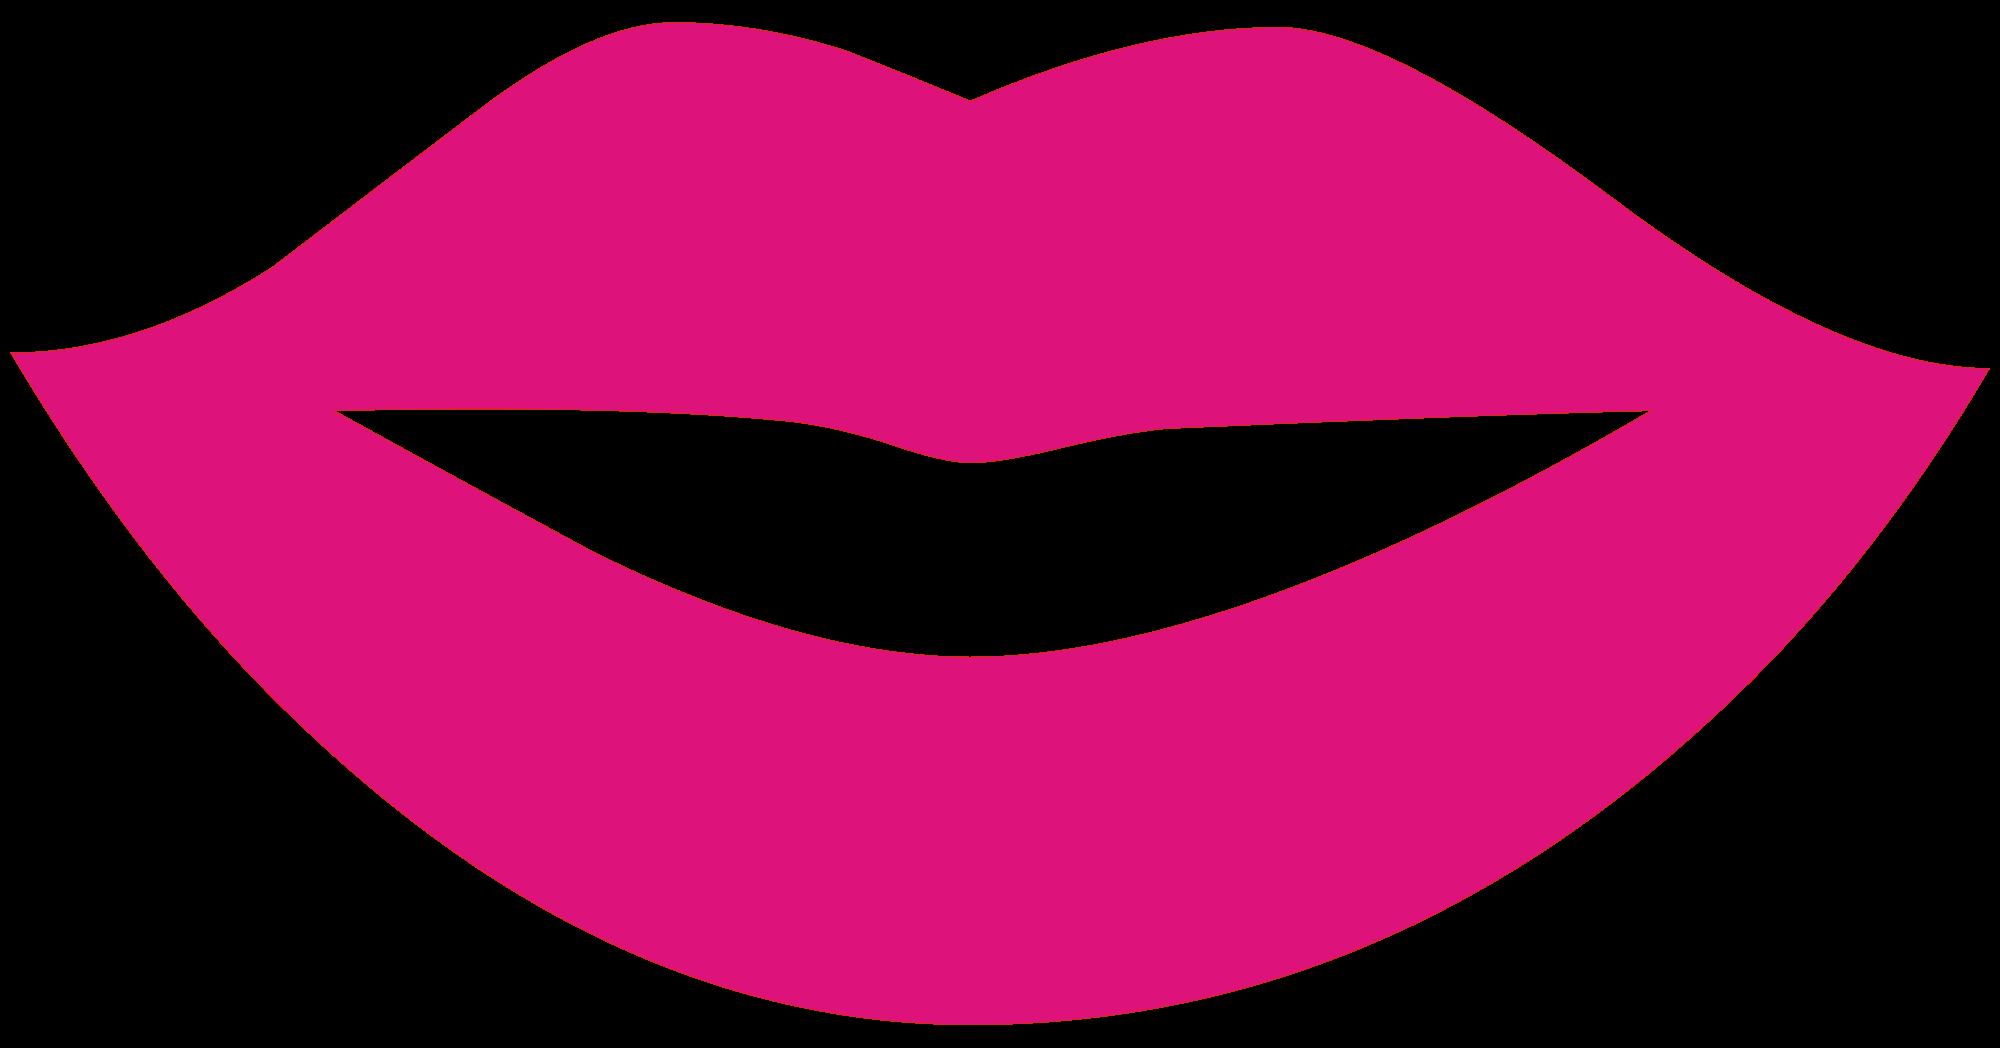 Lips vector png.